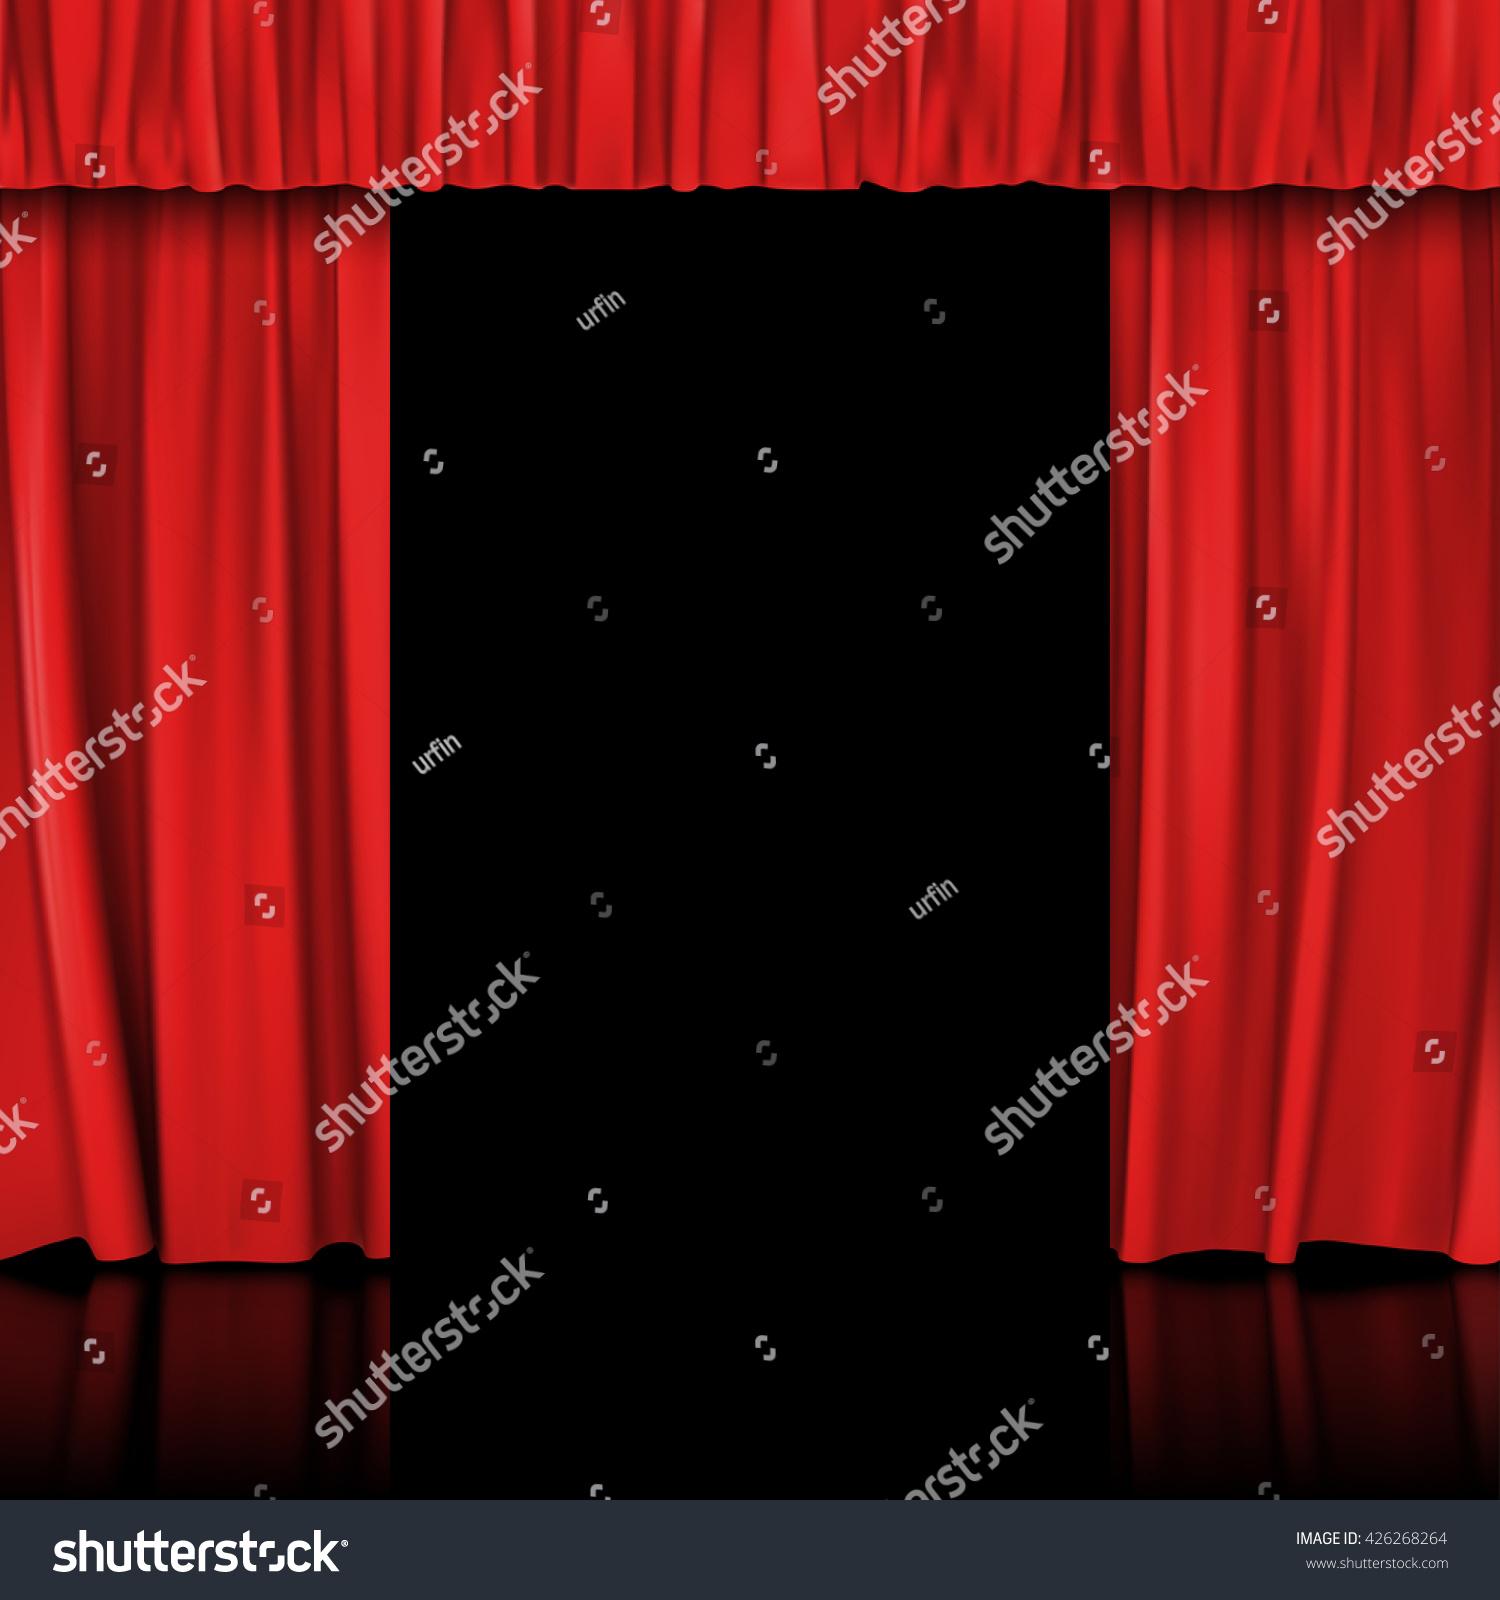 Screen curtains